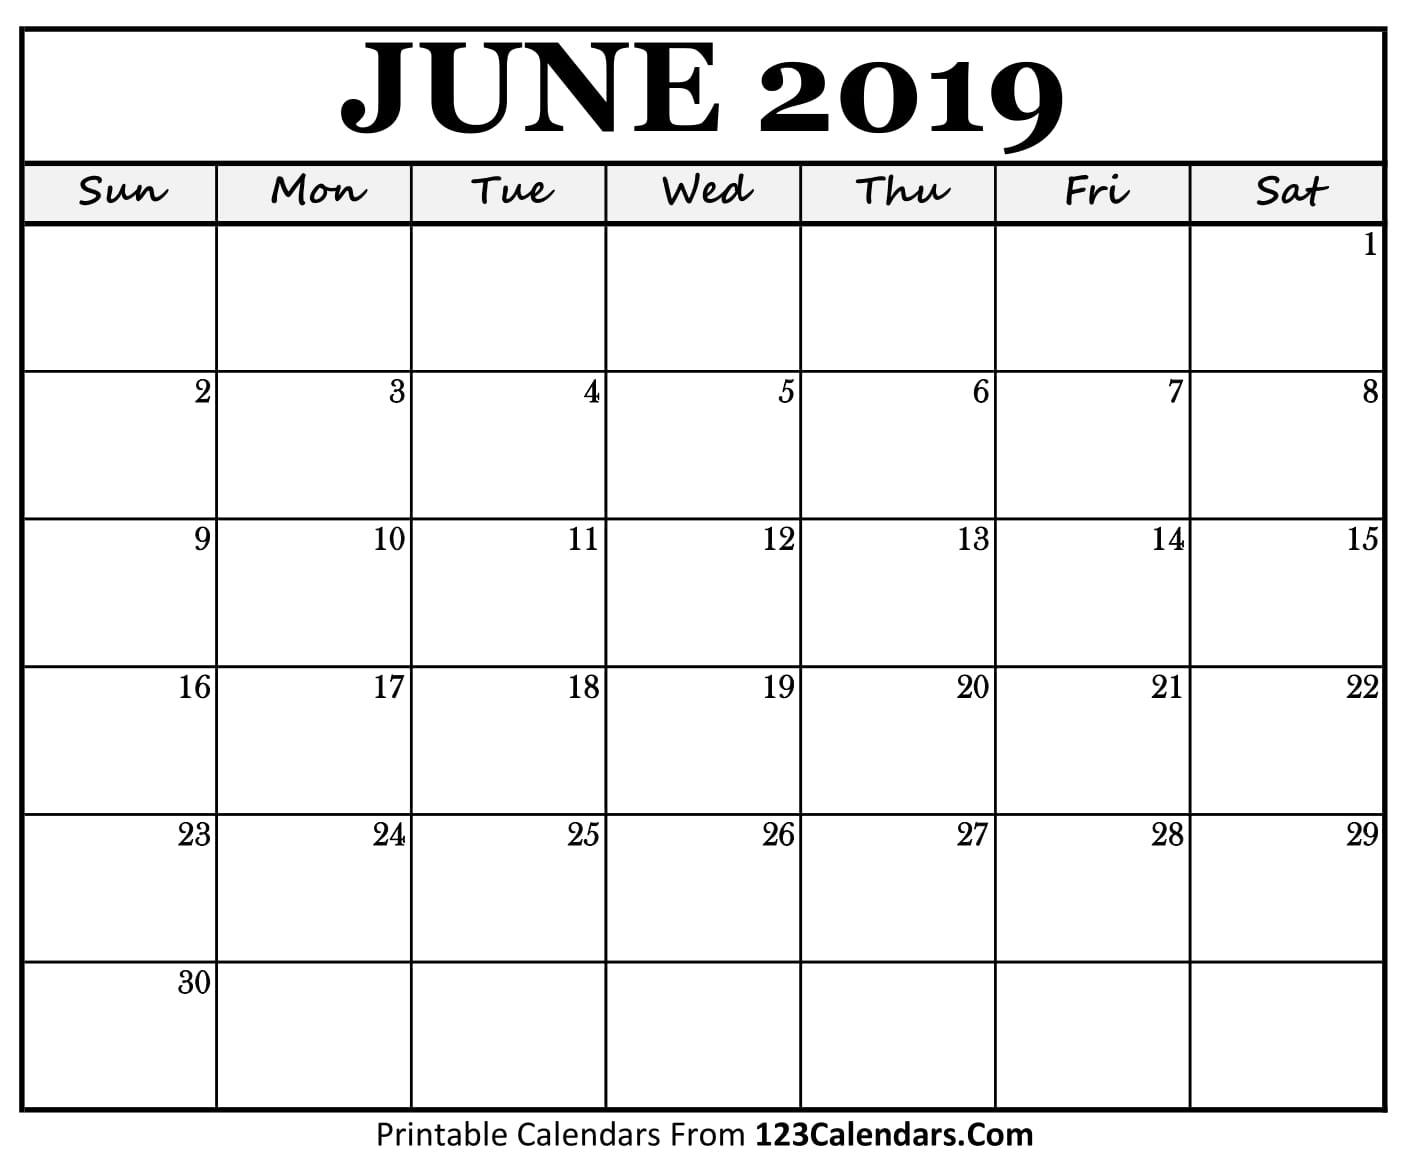 printable june 2018 calendar templates 123calendars com. Black Bedroom Furniture Sets. Home Design Ideas